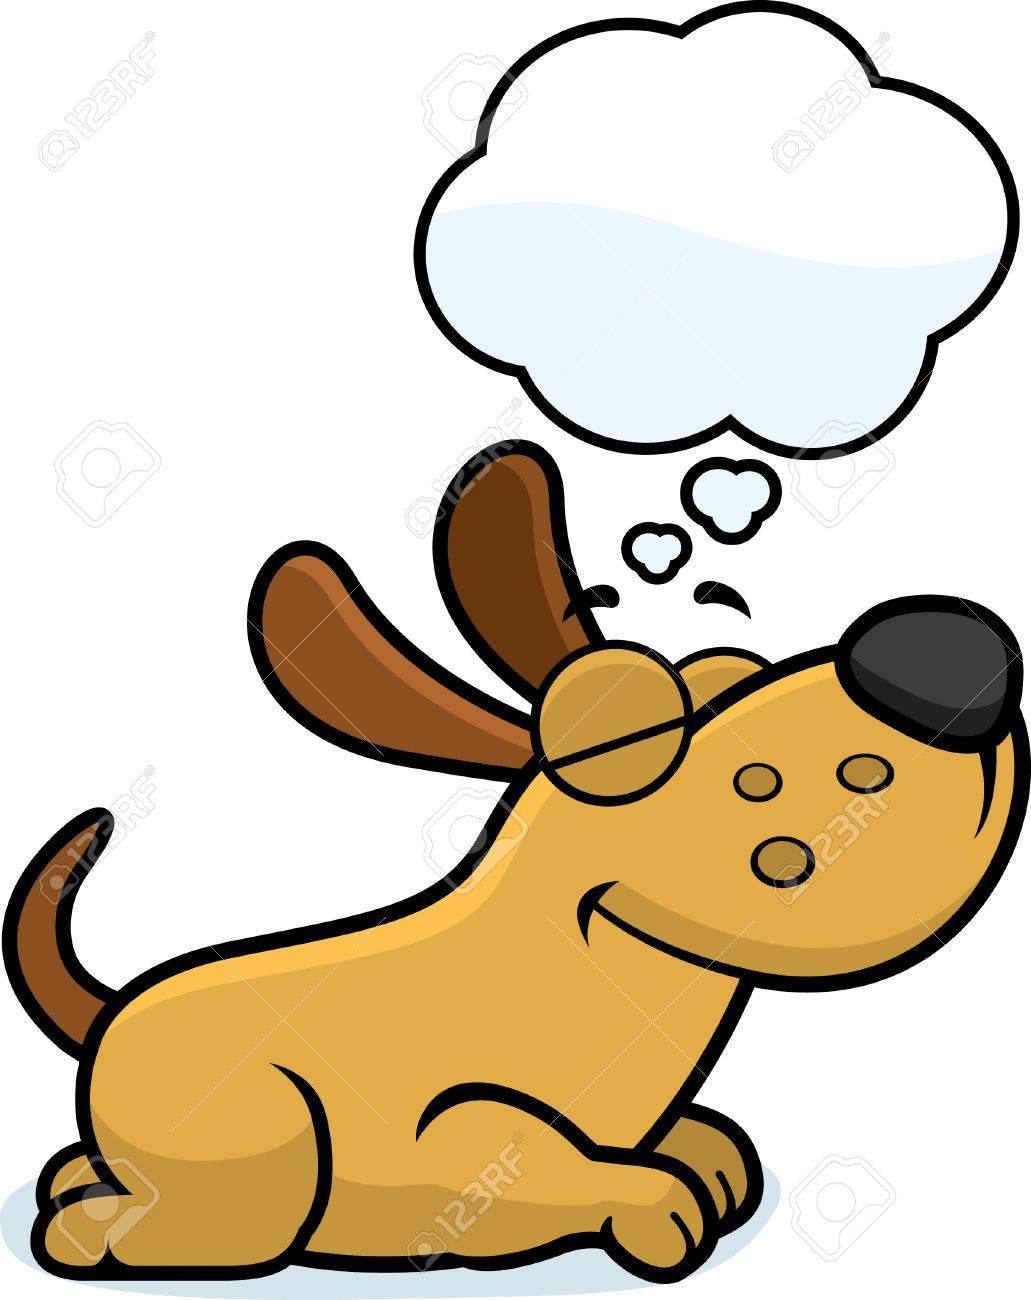 a cartoon illustration of a dog sleeping and dreaming royalty free rh 123rf com  sleeping dog animated clipart